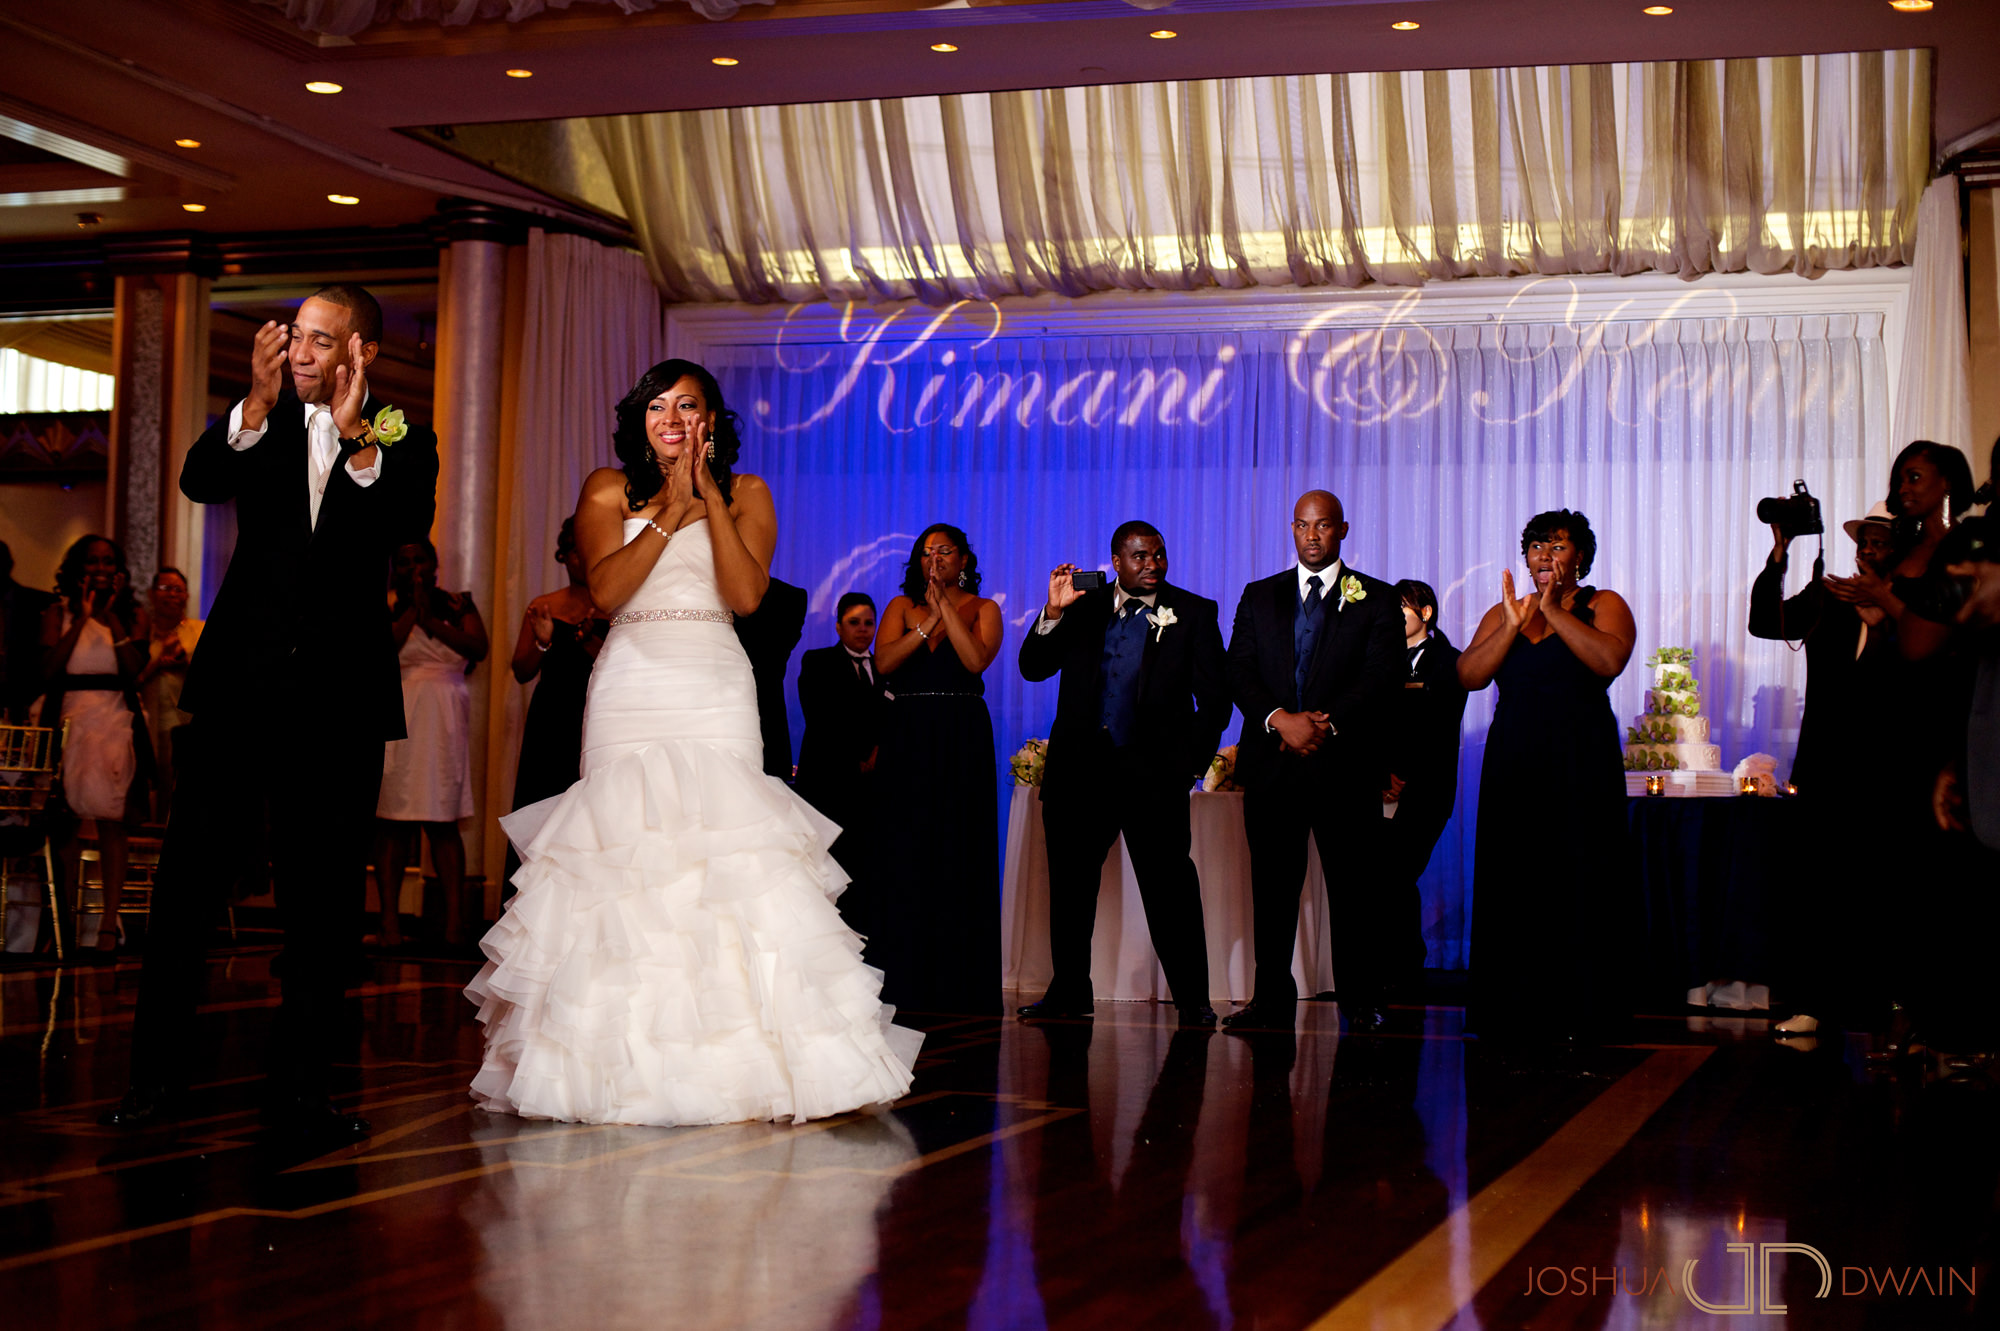 kimani-kevin-019-chateau-briandcarle-place-new-yorkwedding-photographer-joshua-dwain-2012-10-07_KK_415